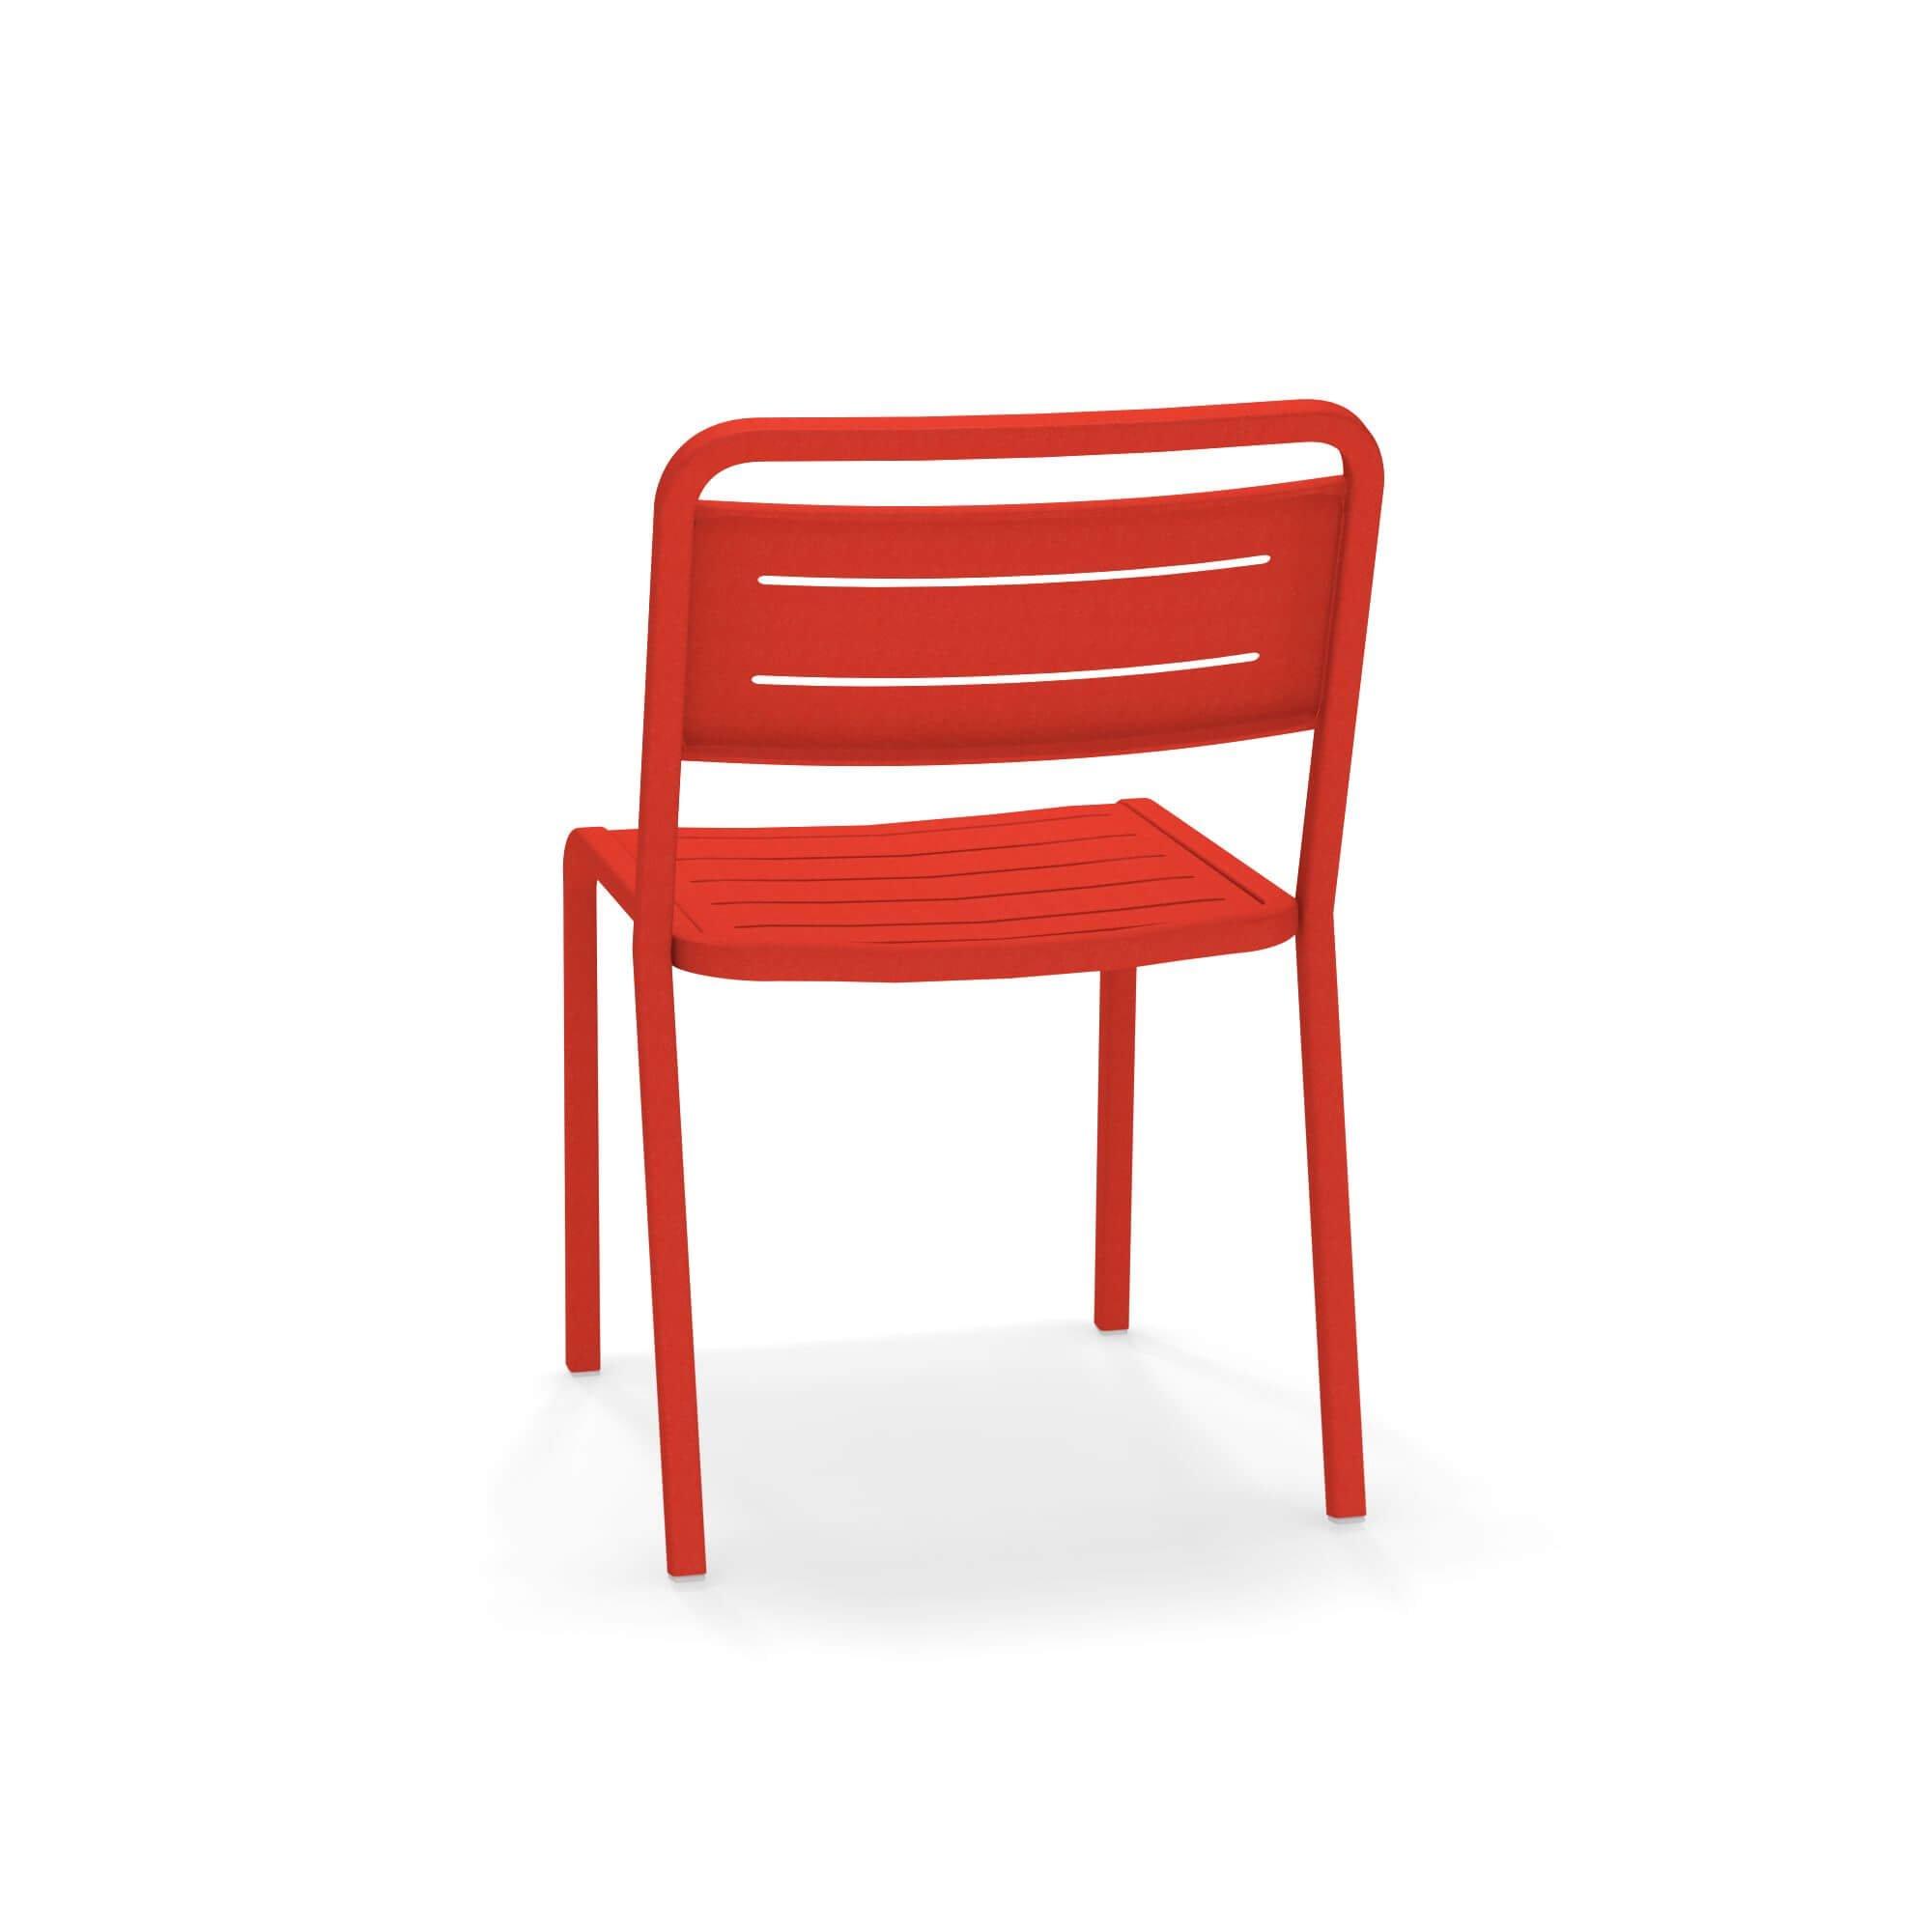 Urban Chair from Emu, designed by Samuel Wilkinson